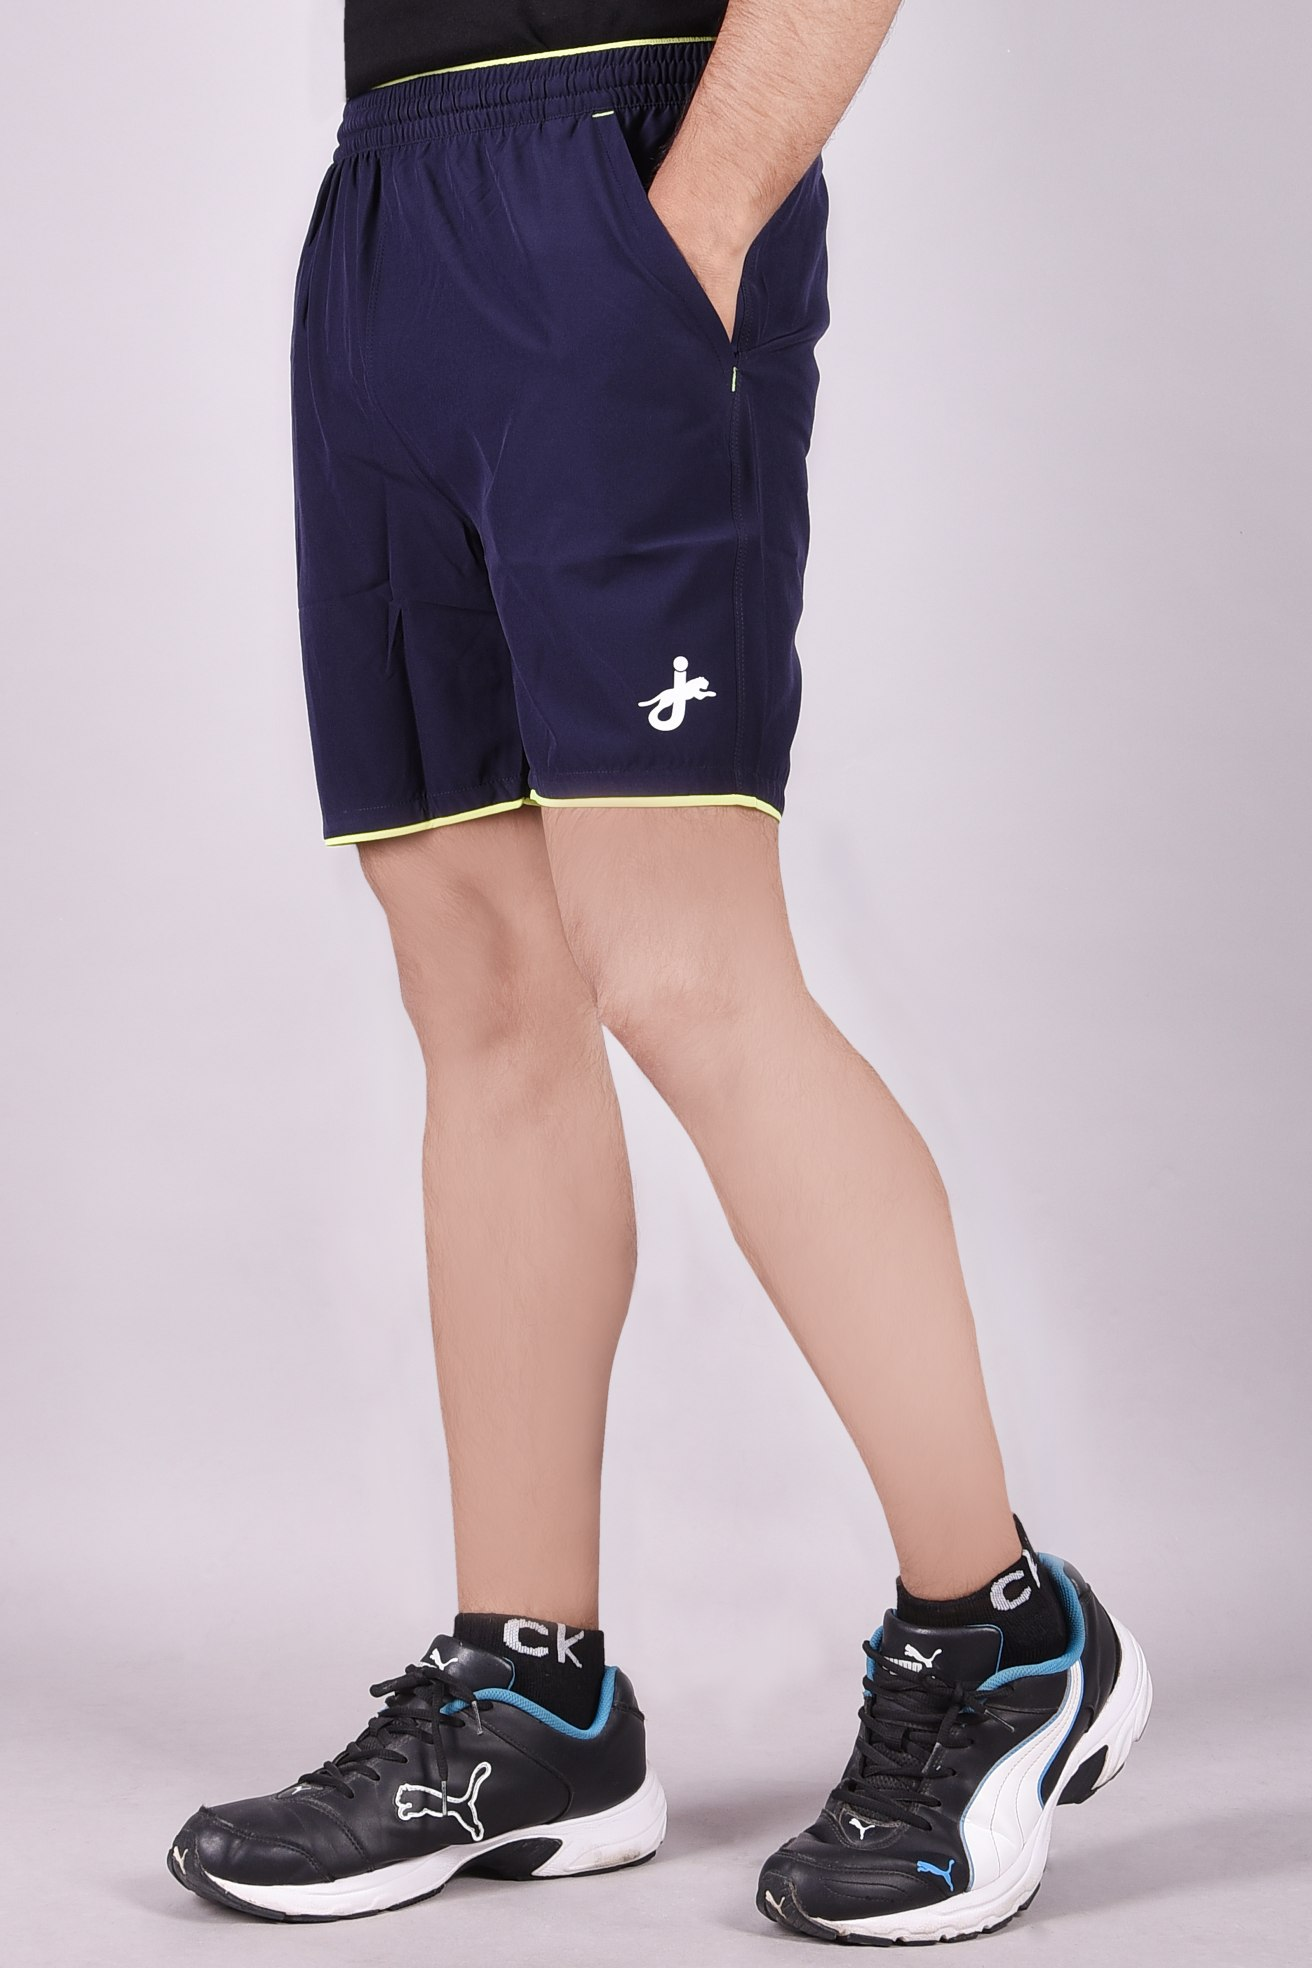 JAGURO   Polyester Stylish Men's Blue Shorts.